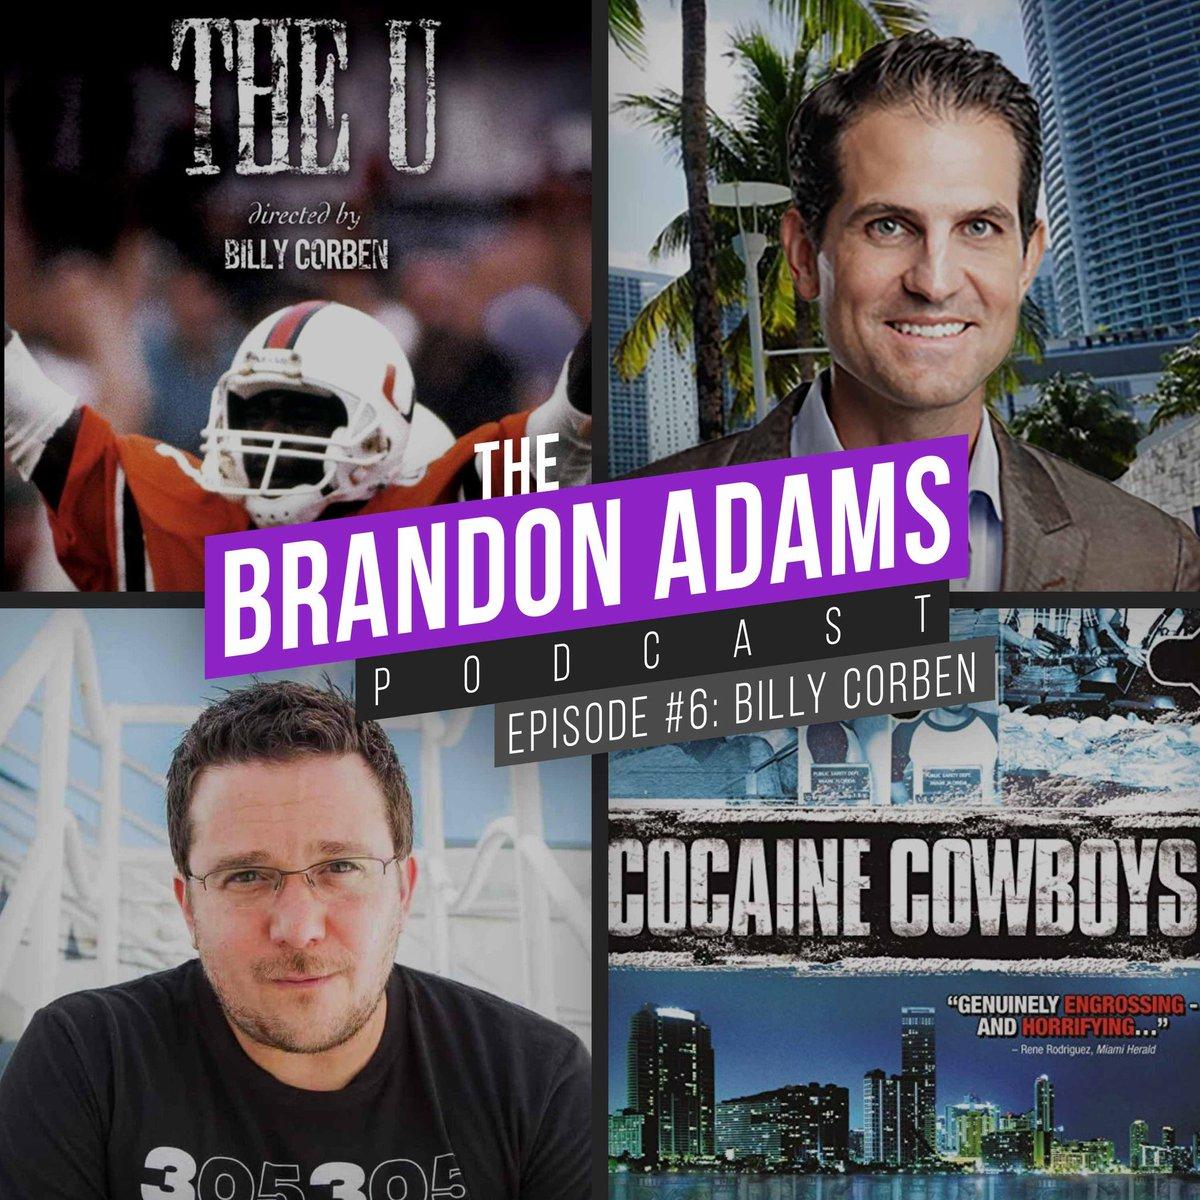 Podcast 6 with legend @BillyCorben is up! Enjoy! youtube.com/watch?v=DpRJg6…